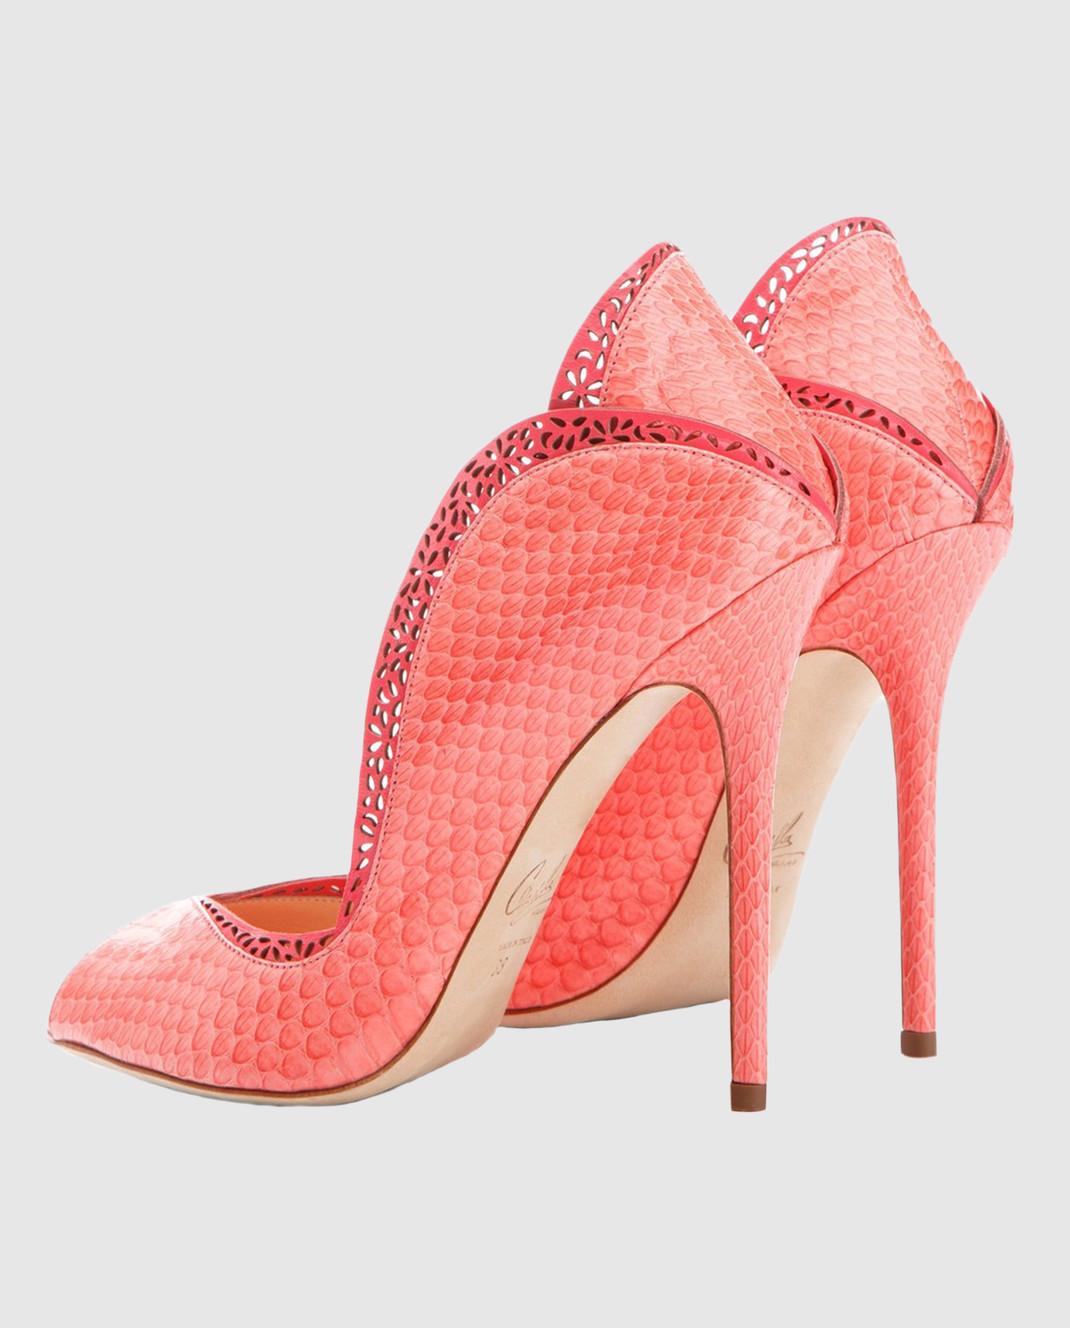 Cerasella Коралловые туфли из кожи питона DANAEELAPHE DANAEELAPHE изображение 4